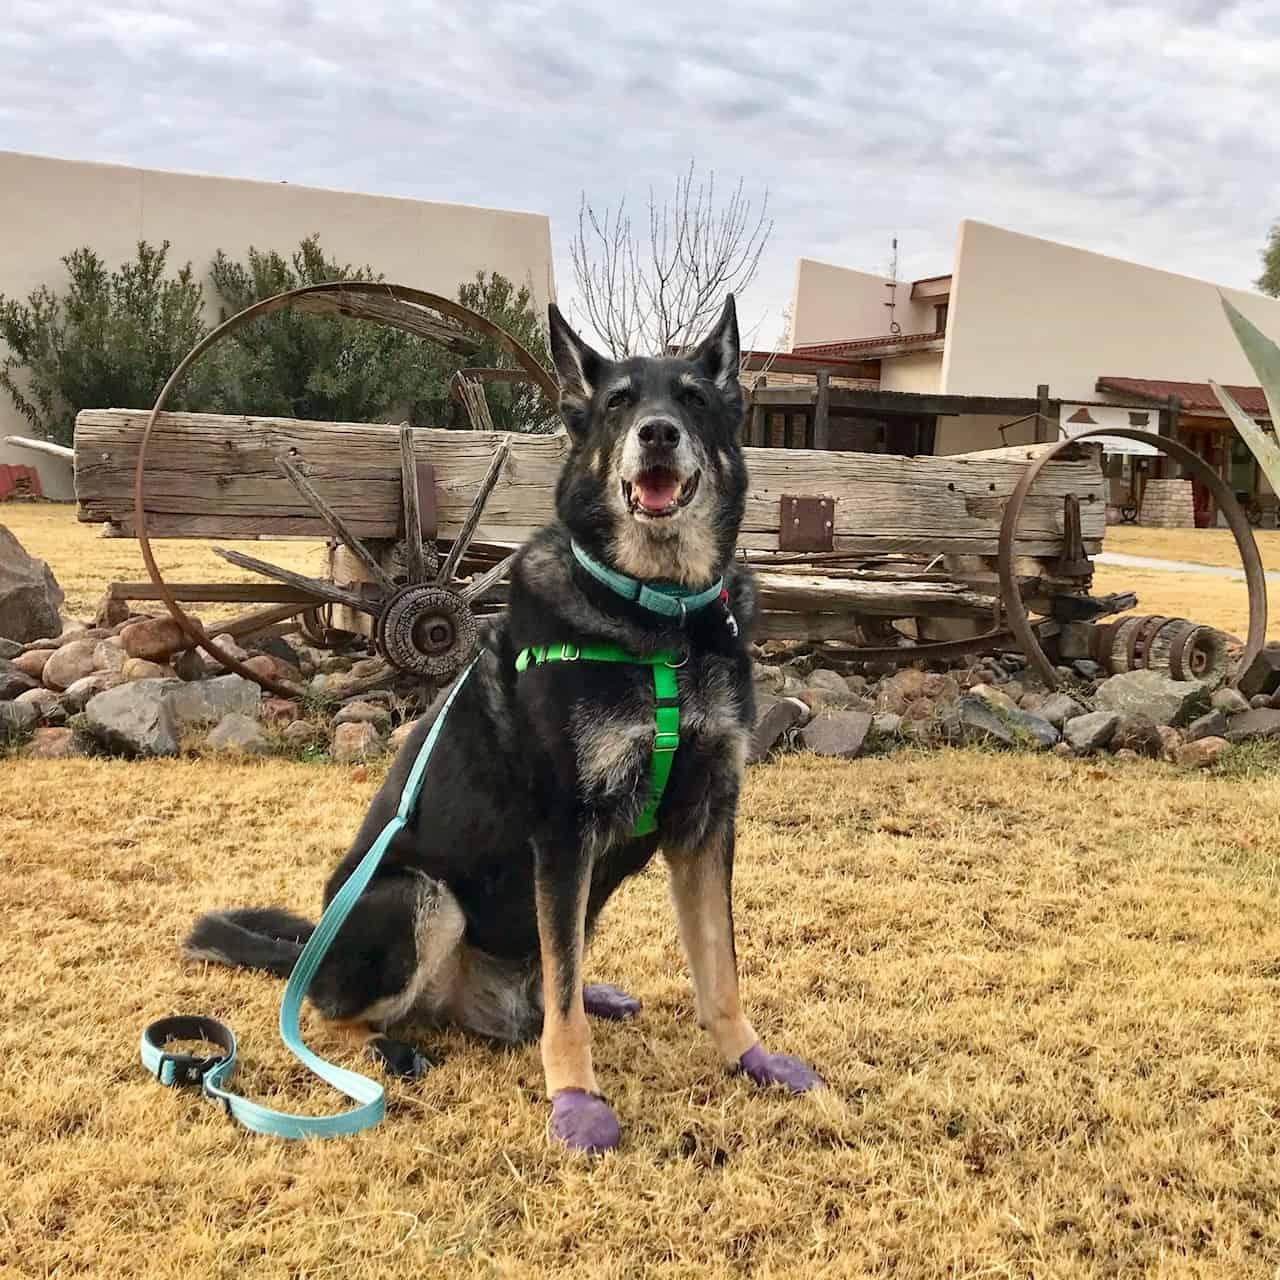 Buster the German Shepherd Dog wearing purple dog boots in Texas